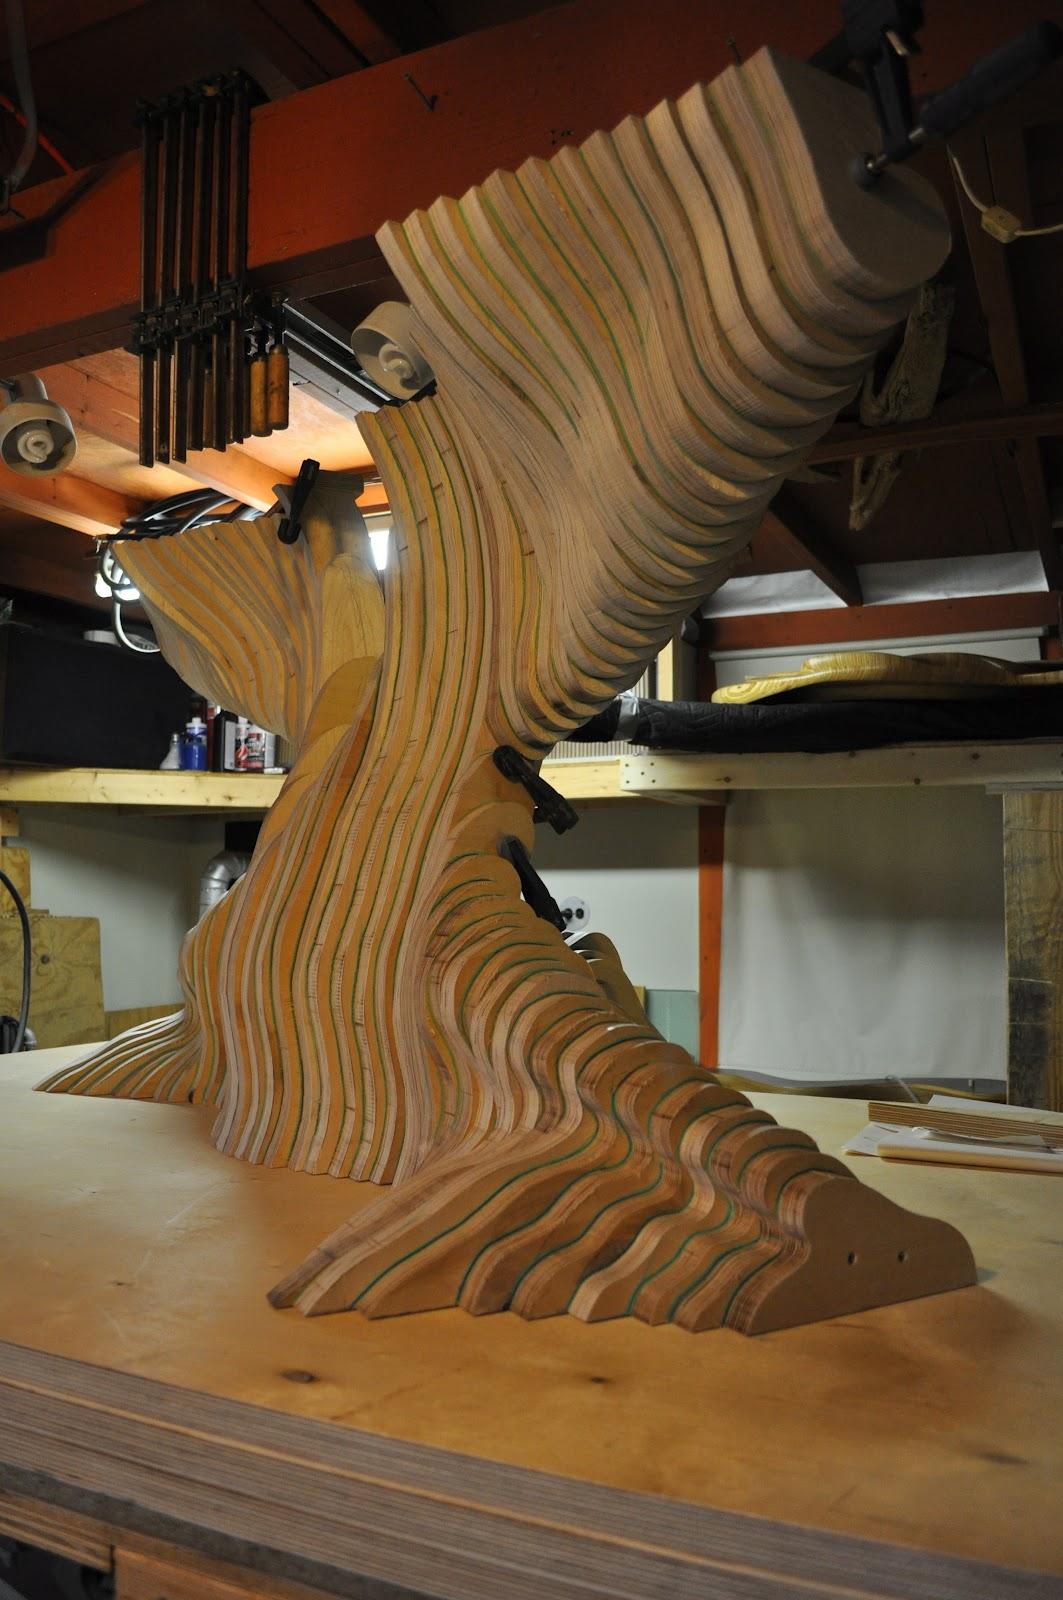 David knopp sculpture work in progress